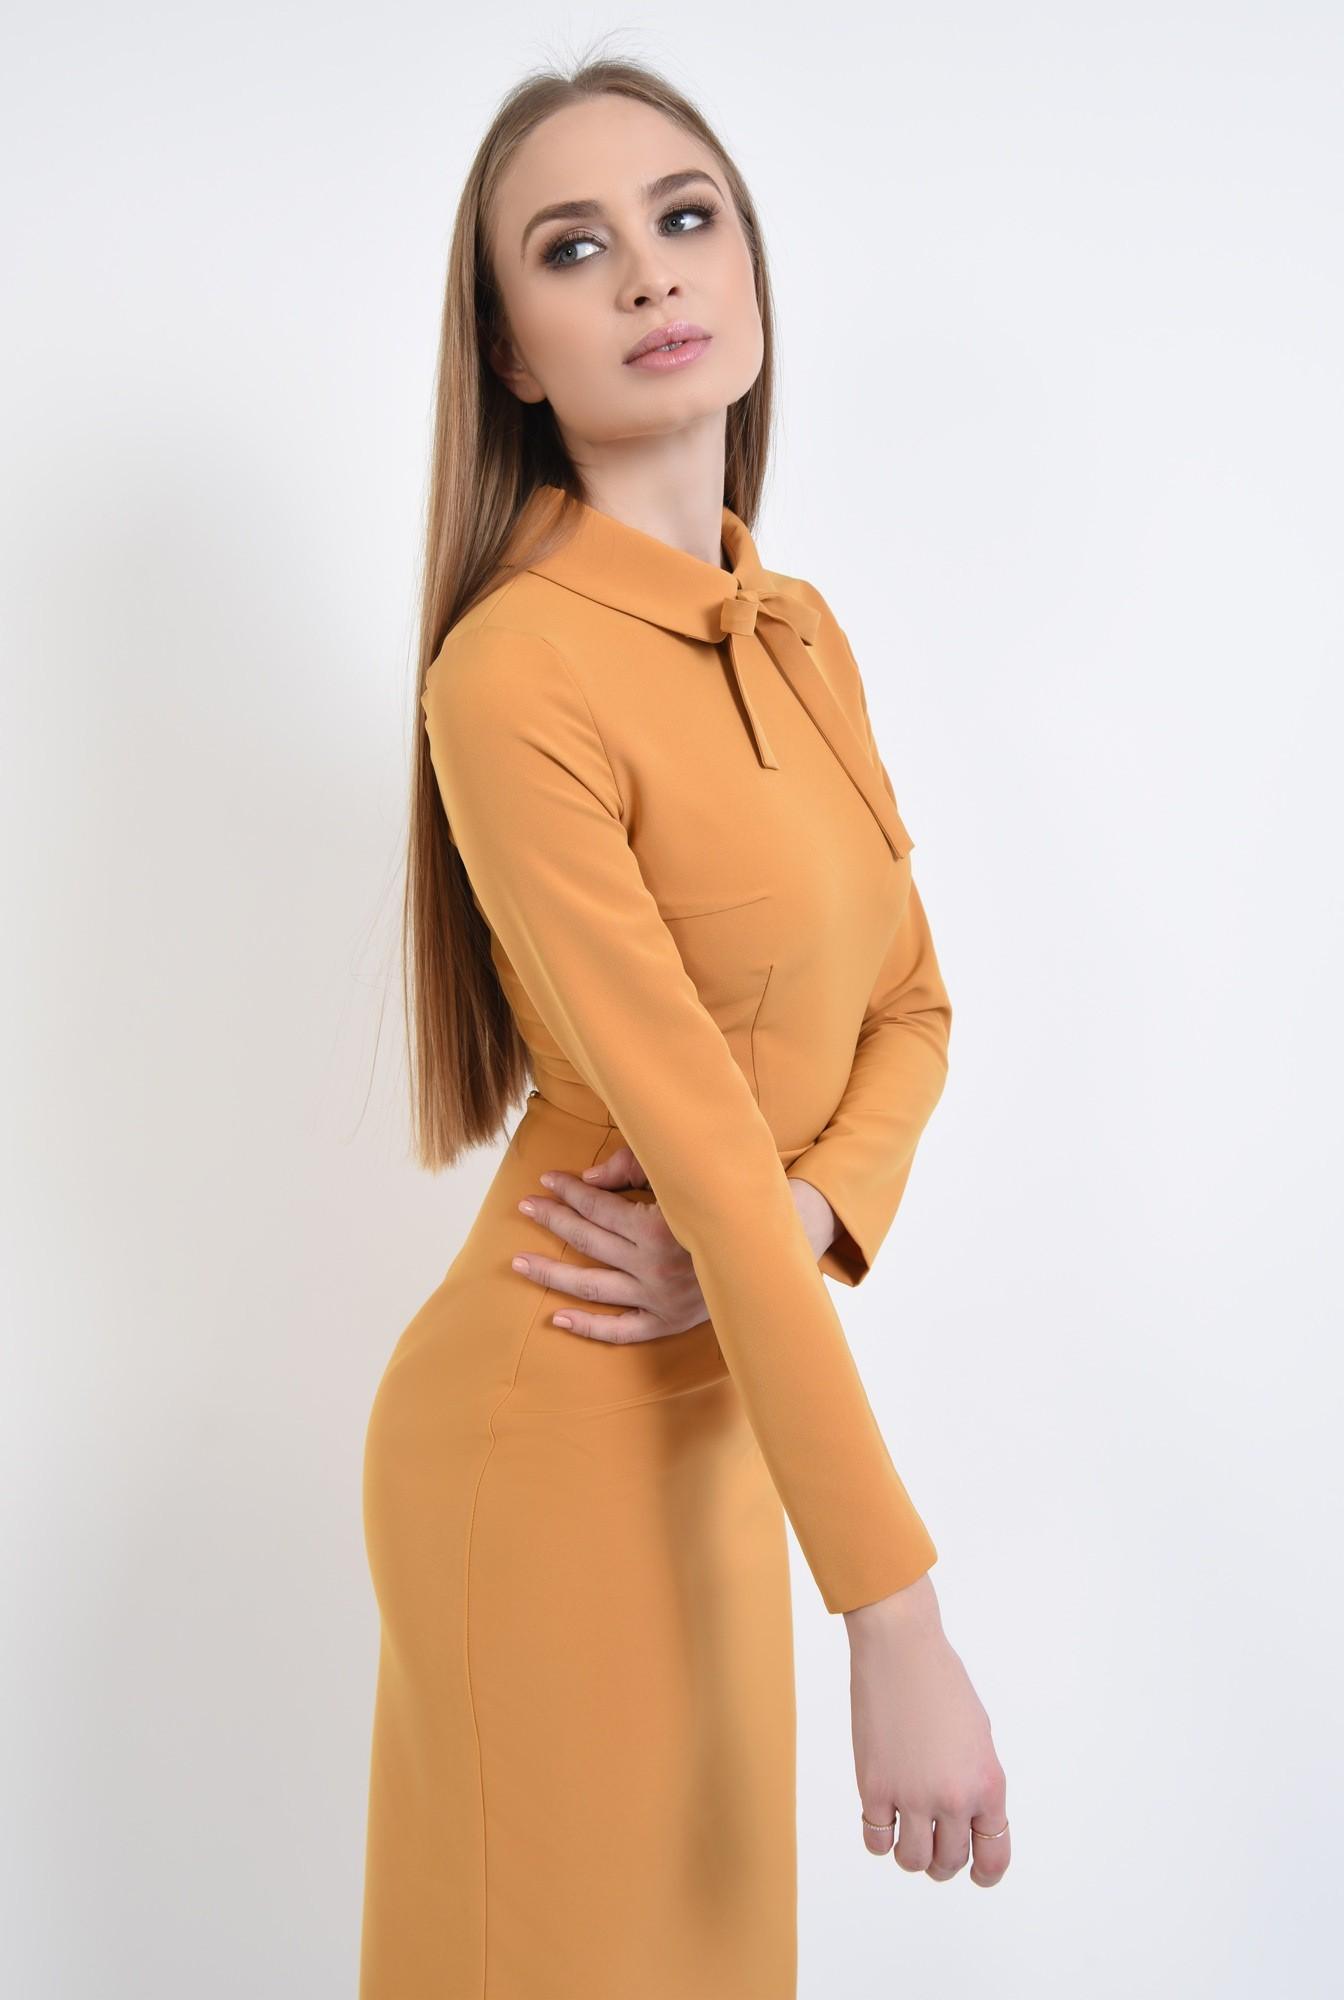 2 - rochie casual, galben, mustar, maneci lungi, guler, funda